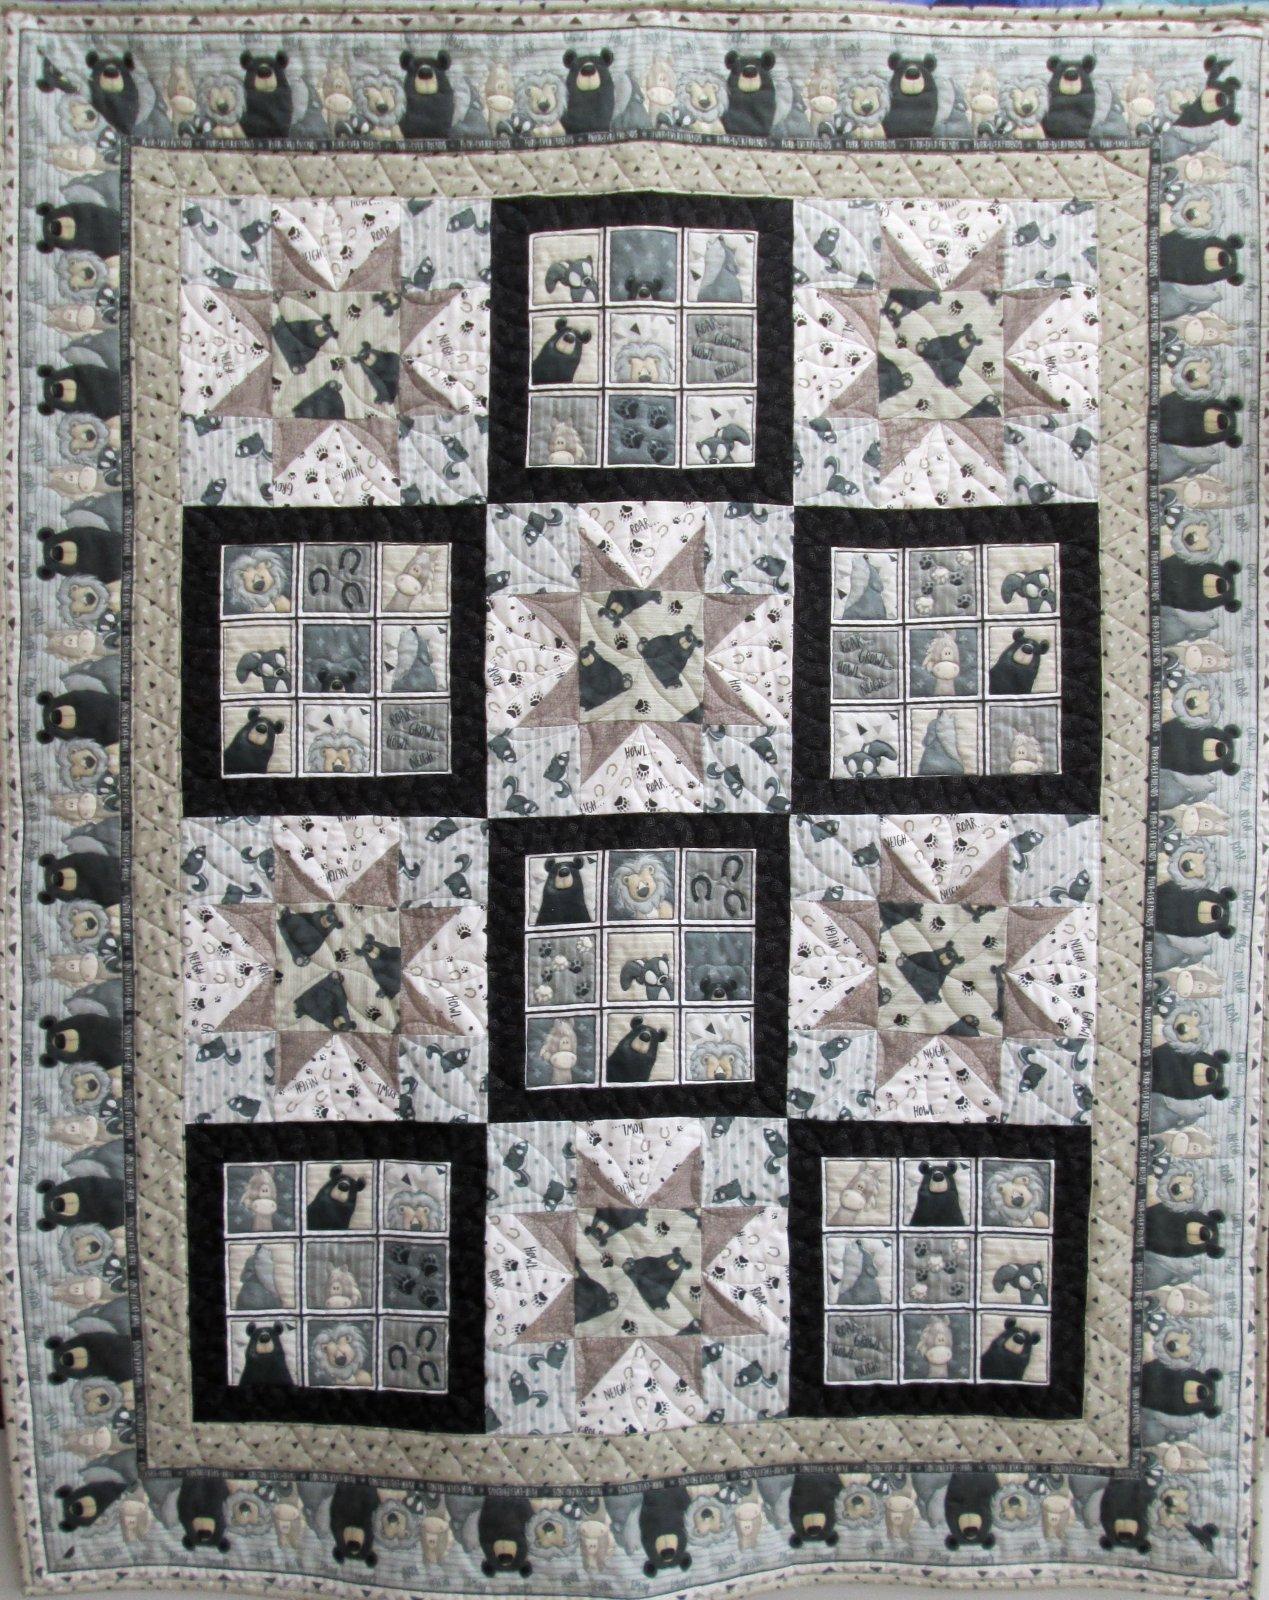 Furr-Ever Friends Flannel Quilt 50x62